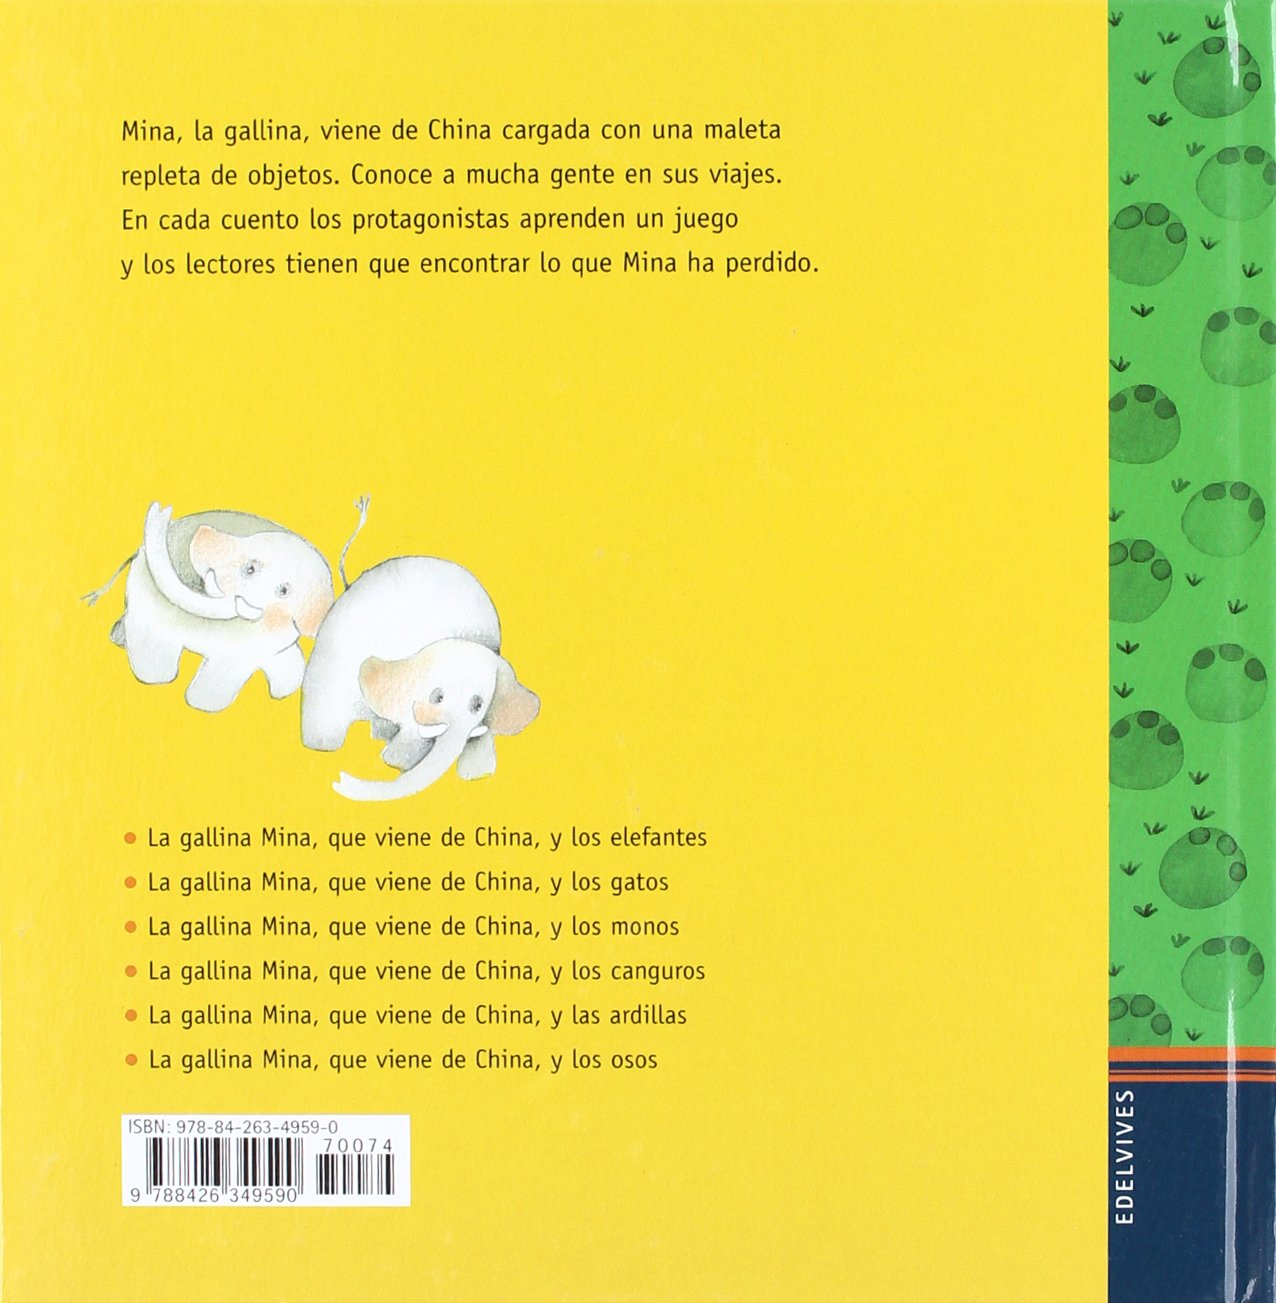 La gallina Mina que viene de China y los elefantes: Mercè Arànega: 9788426349590: Amazon.com: Books